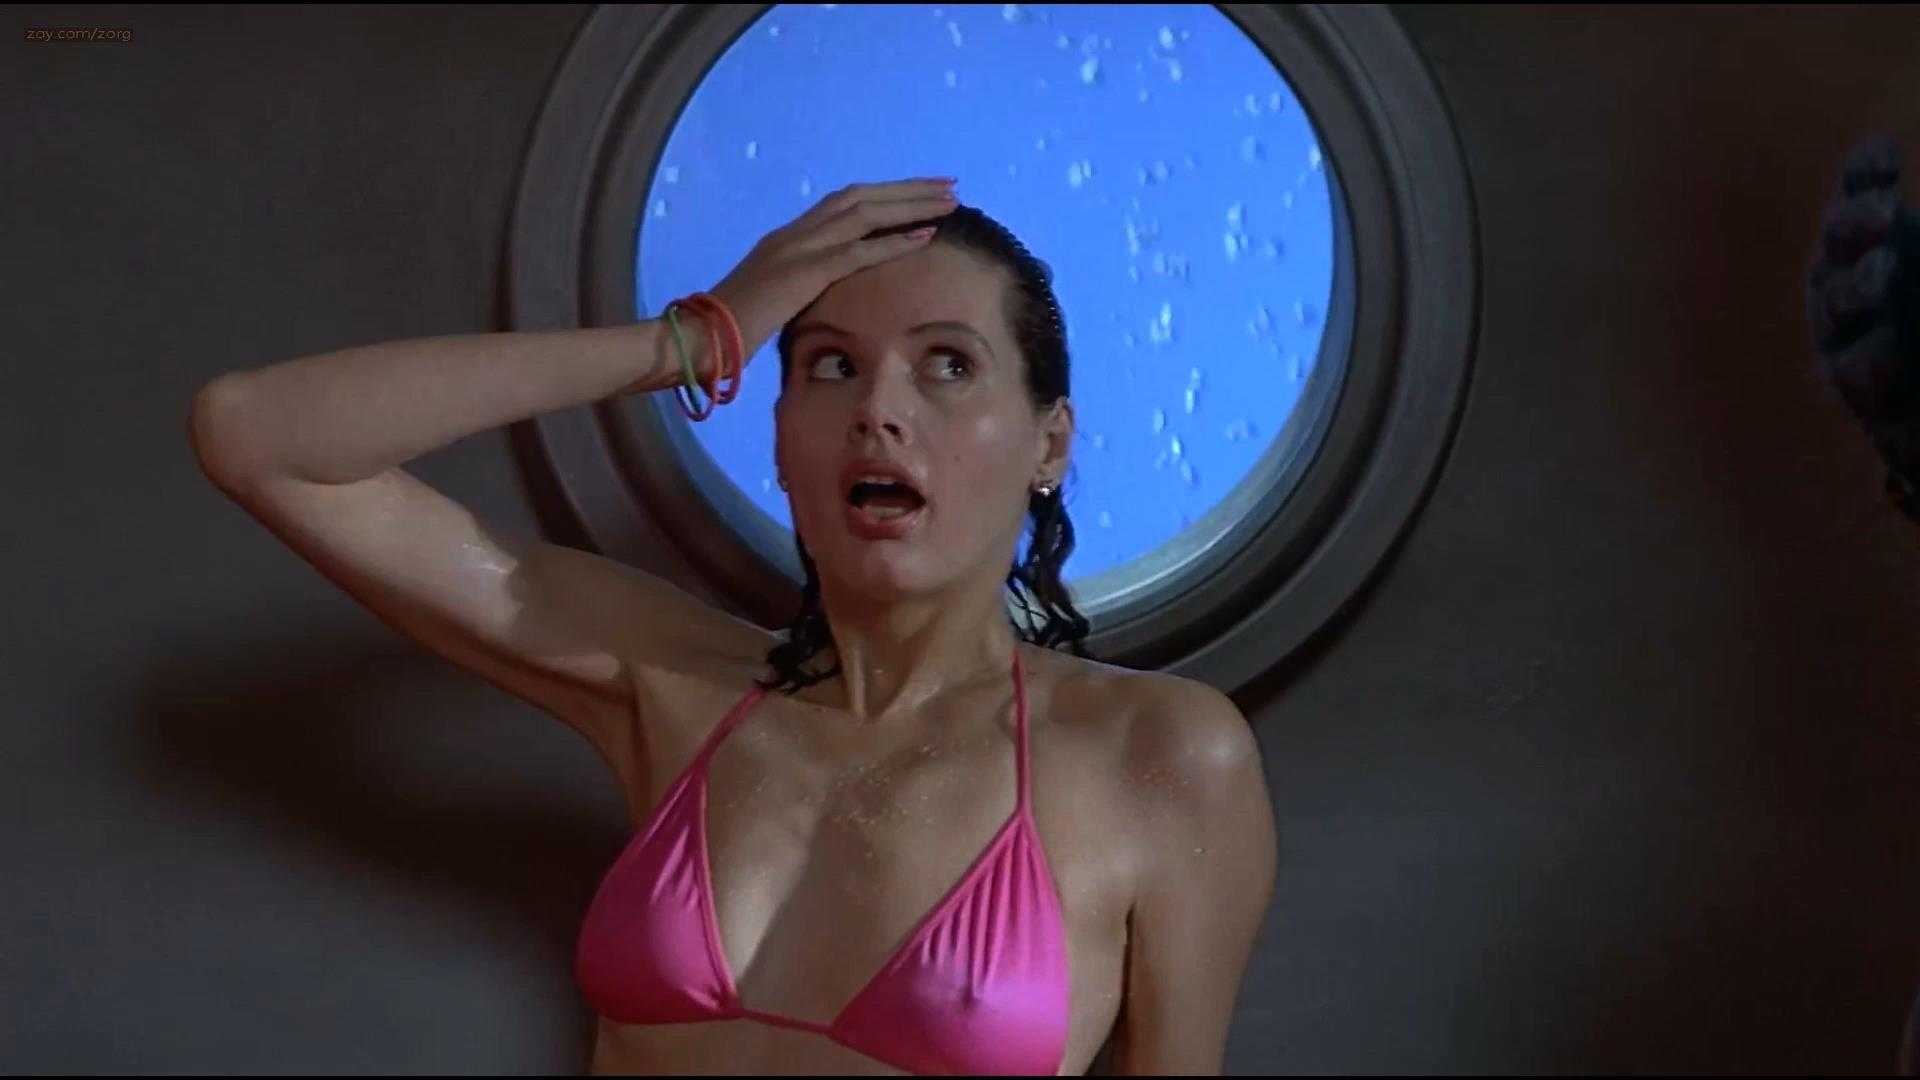 Geena Davis hot and funny in bikini – Earth Girls Are Easy